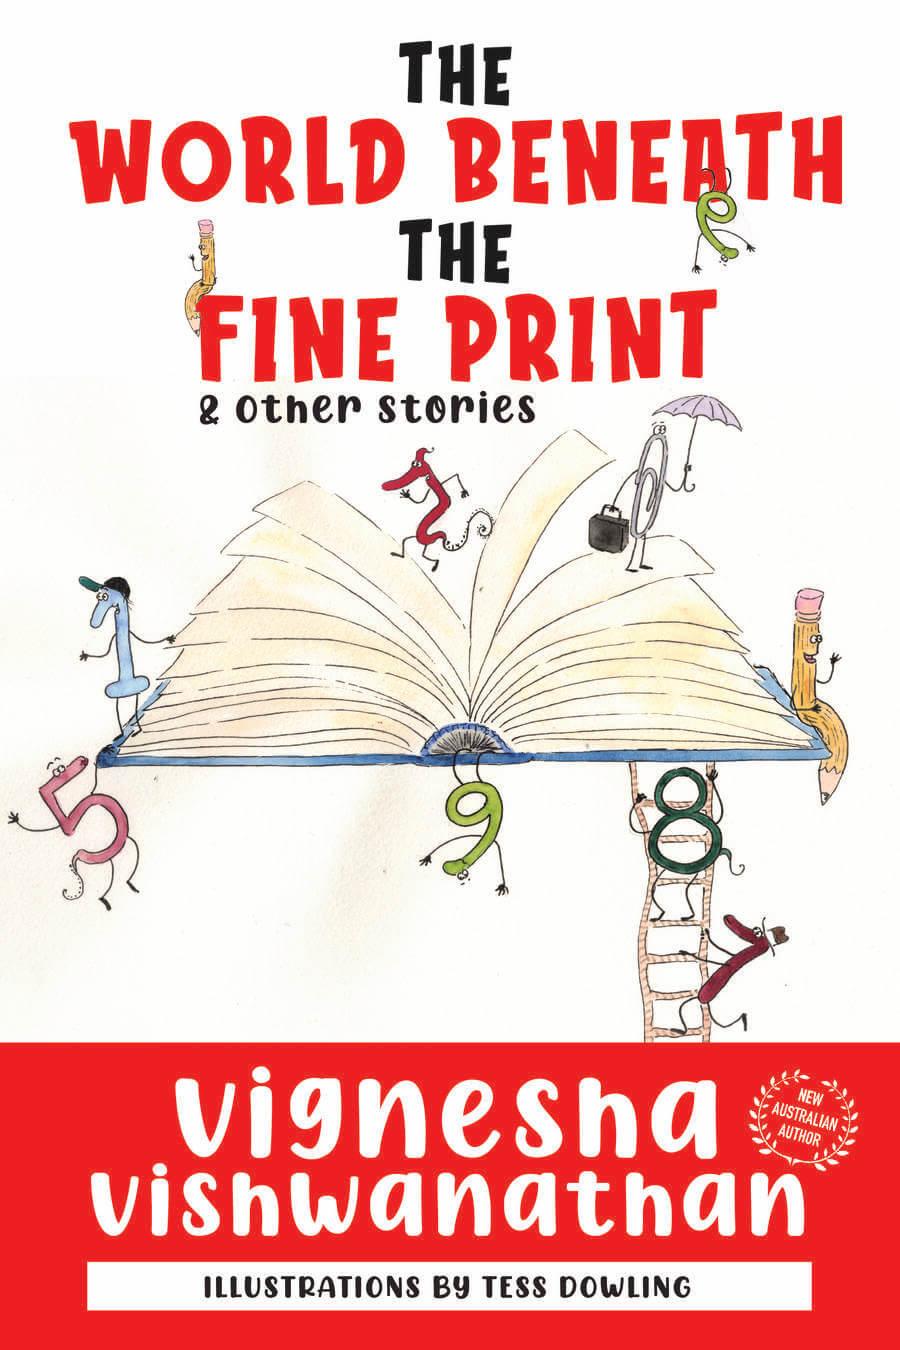 The World Beneath the Fine Print